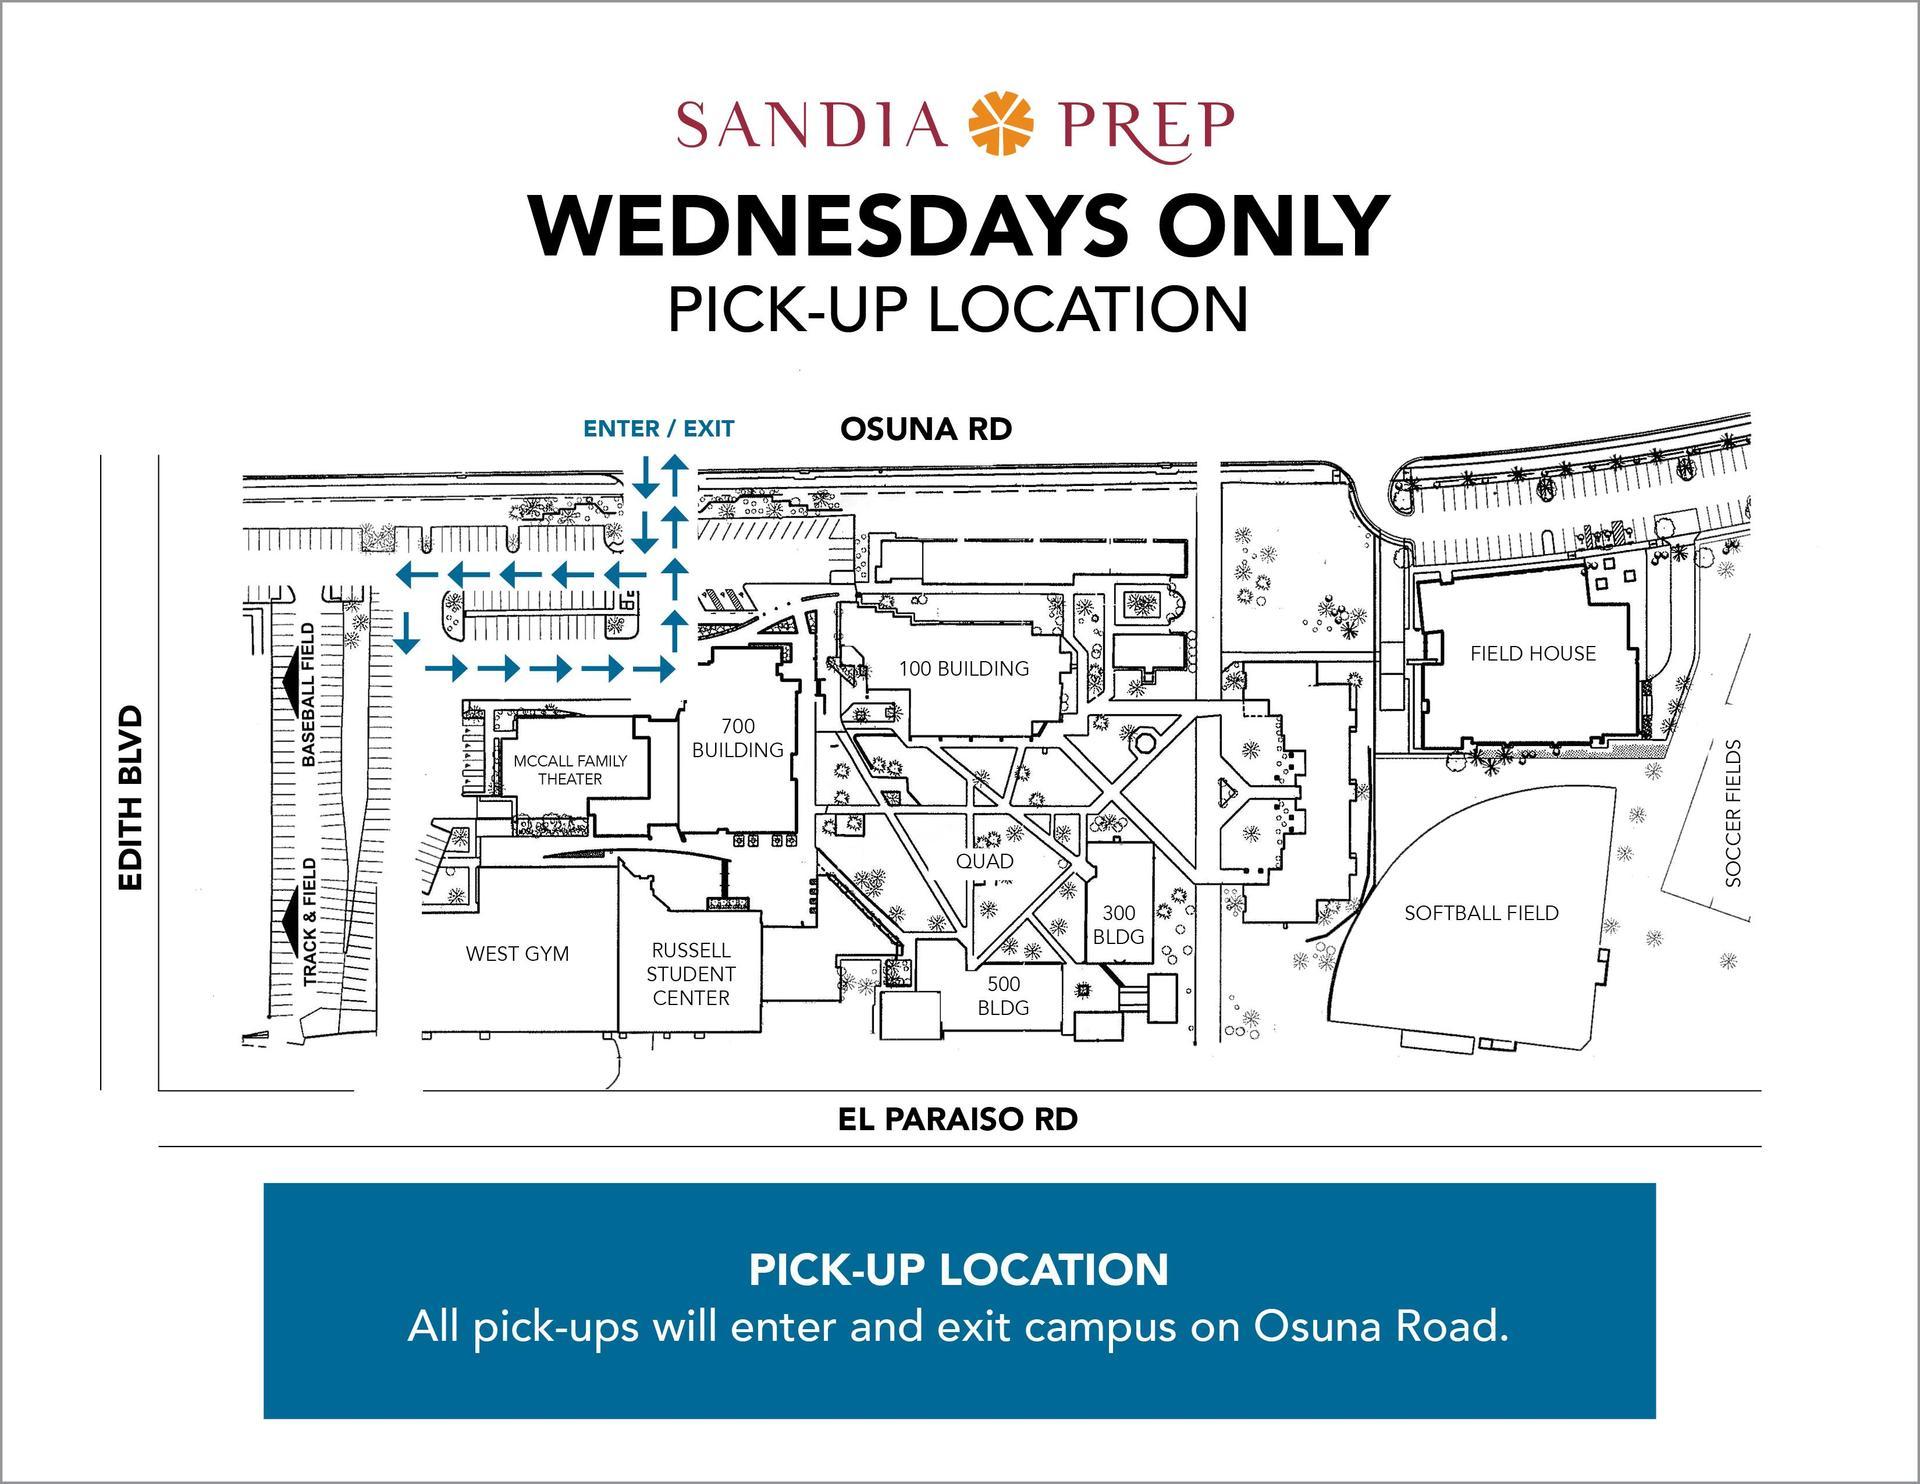 Wednesday Pickup Map